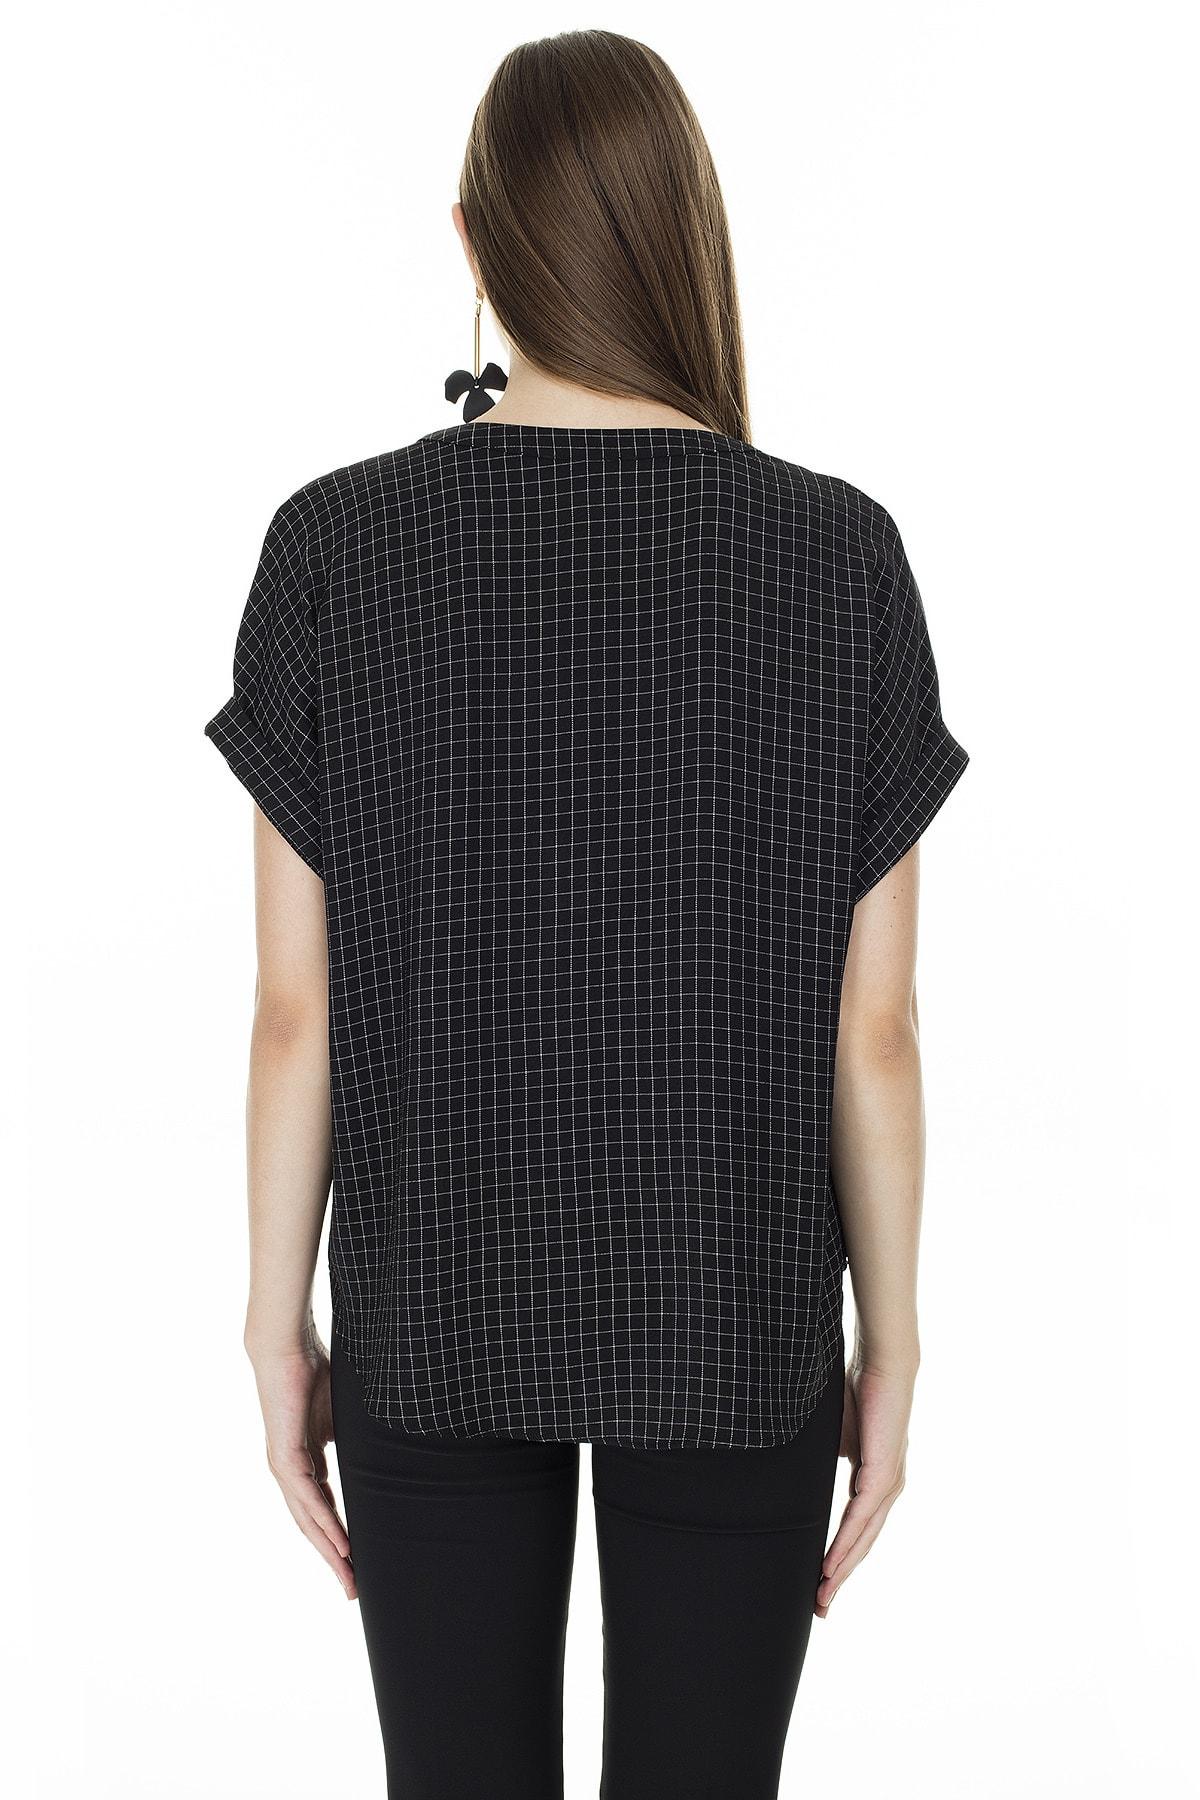 Ayhan Siyah-Ekru Kareli V Yaka Bluz Kadın Bluz 04681405 1